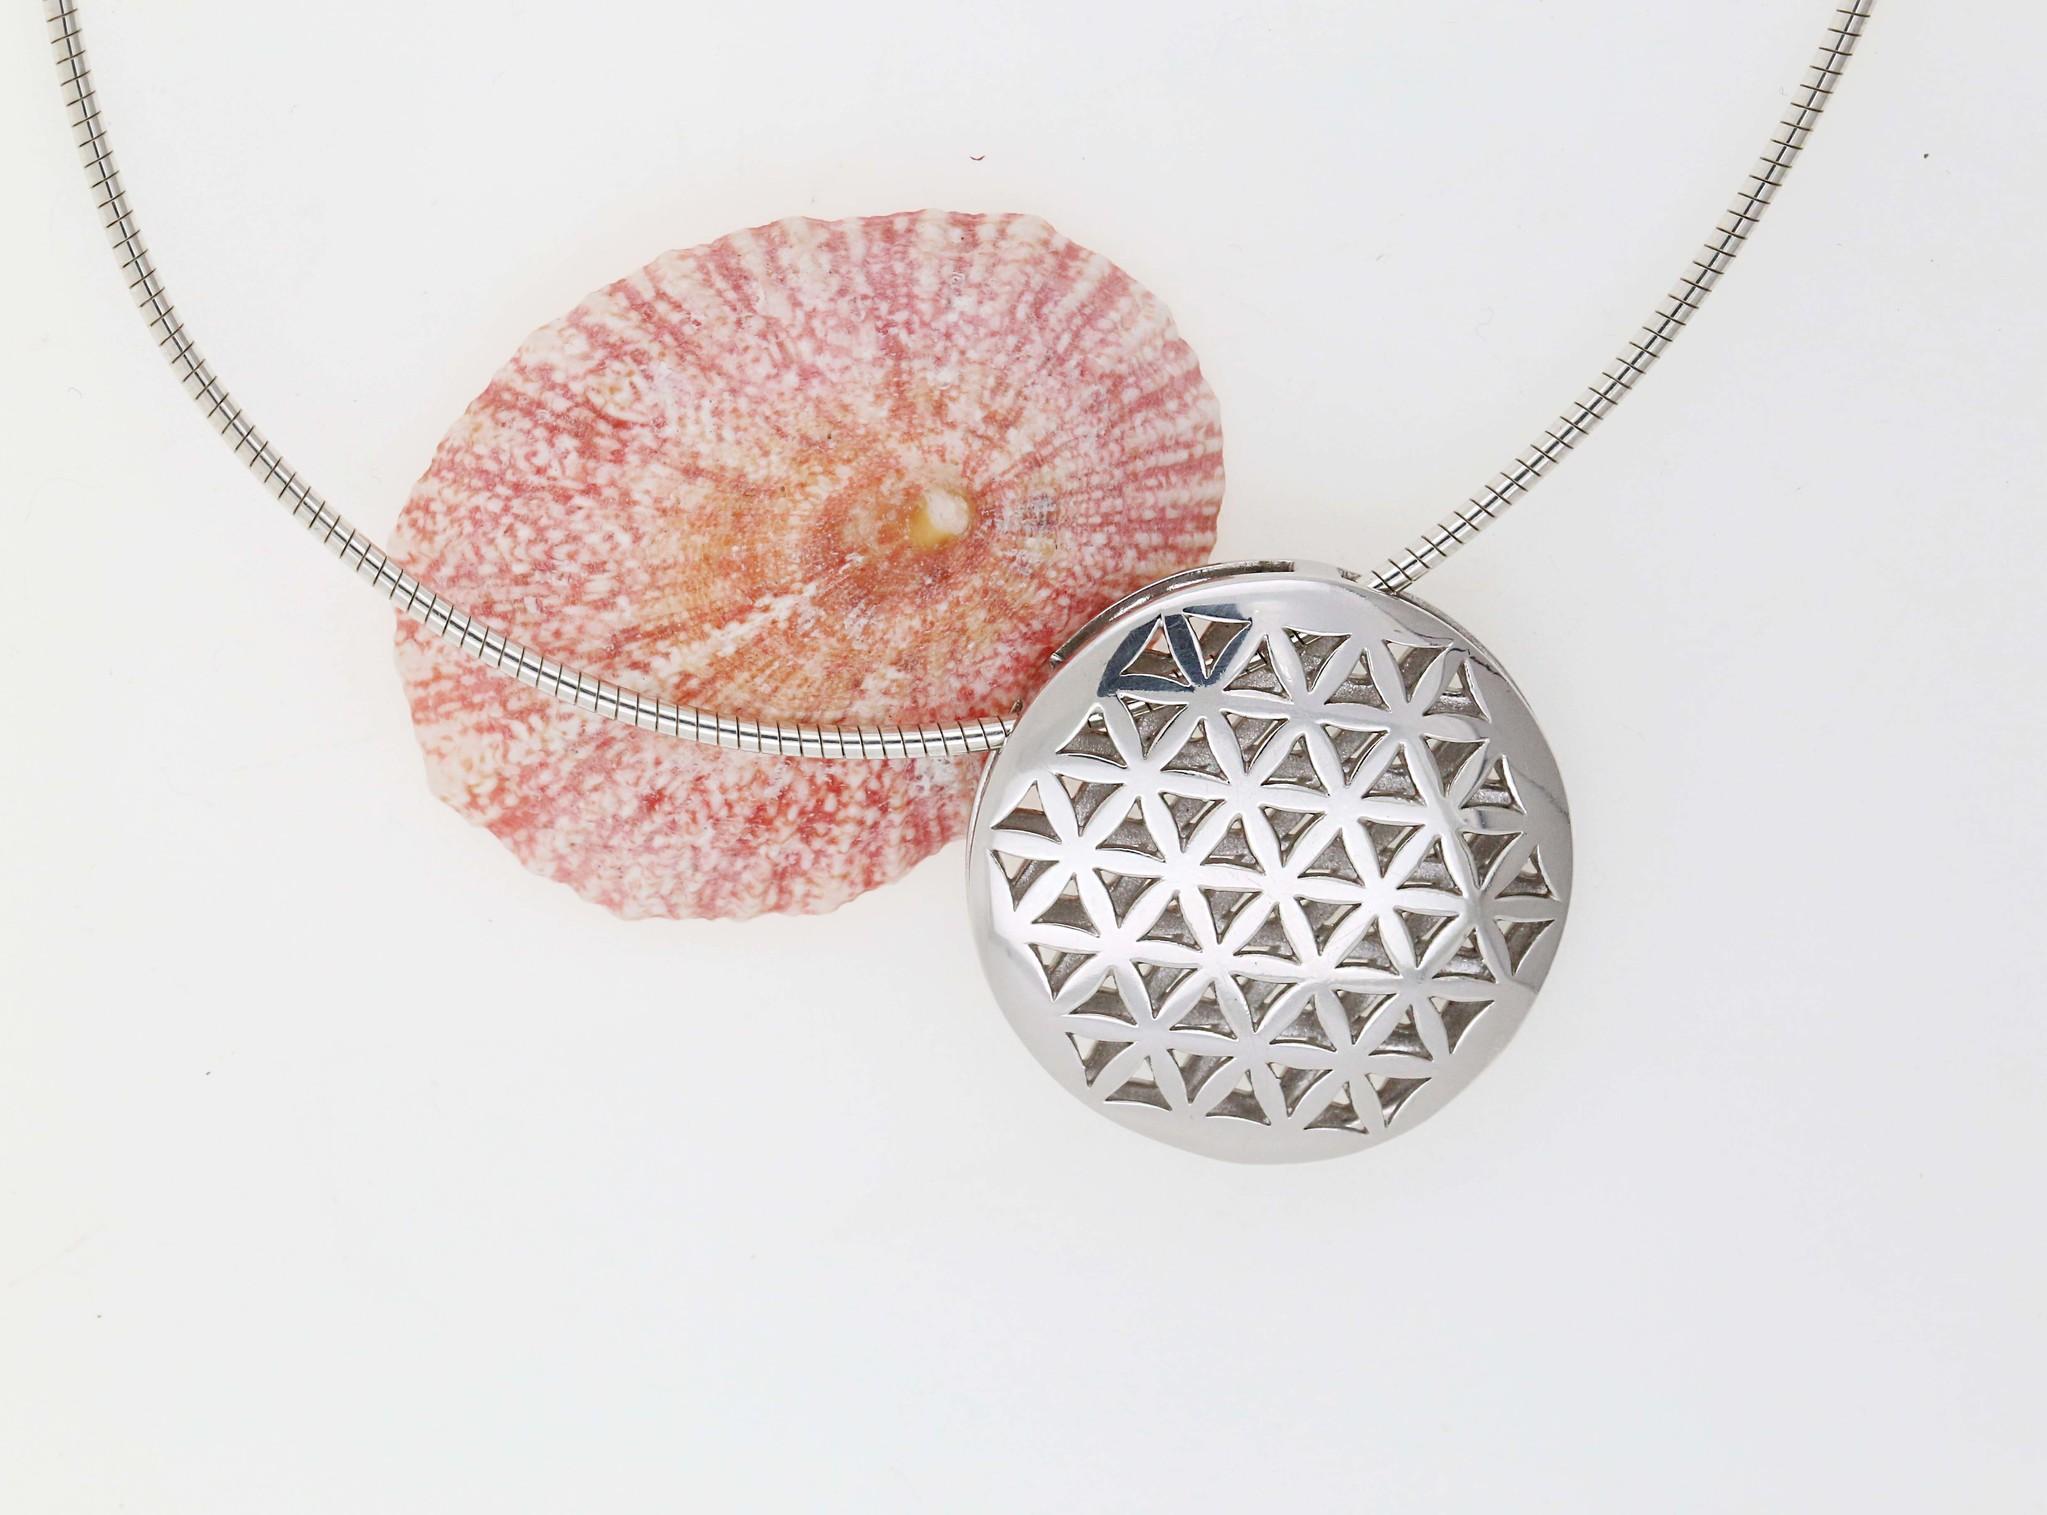 Blume des Lebens 1: Anhänger aus 925er Silber rhodiniert